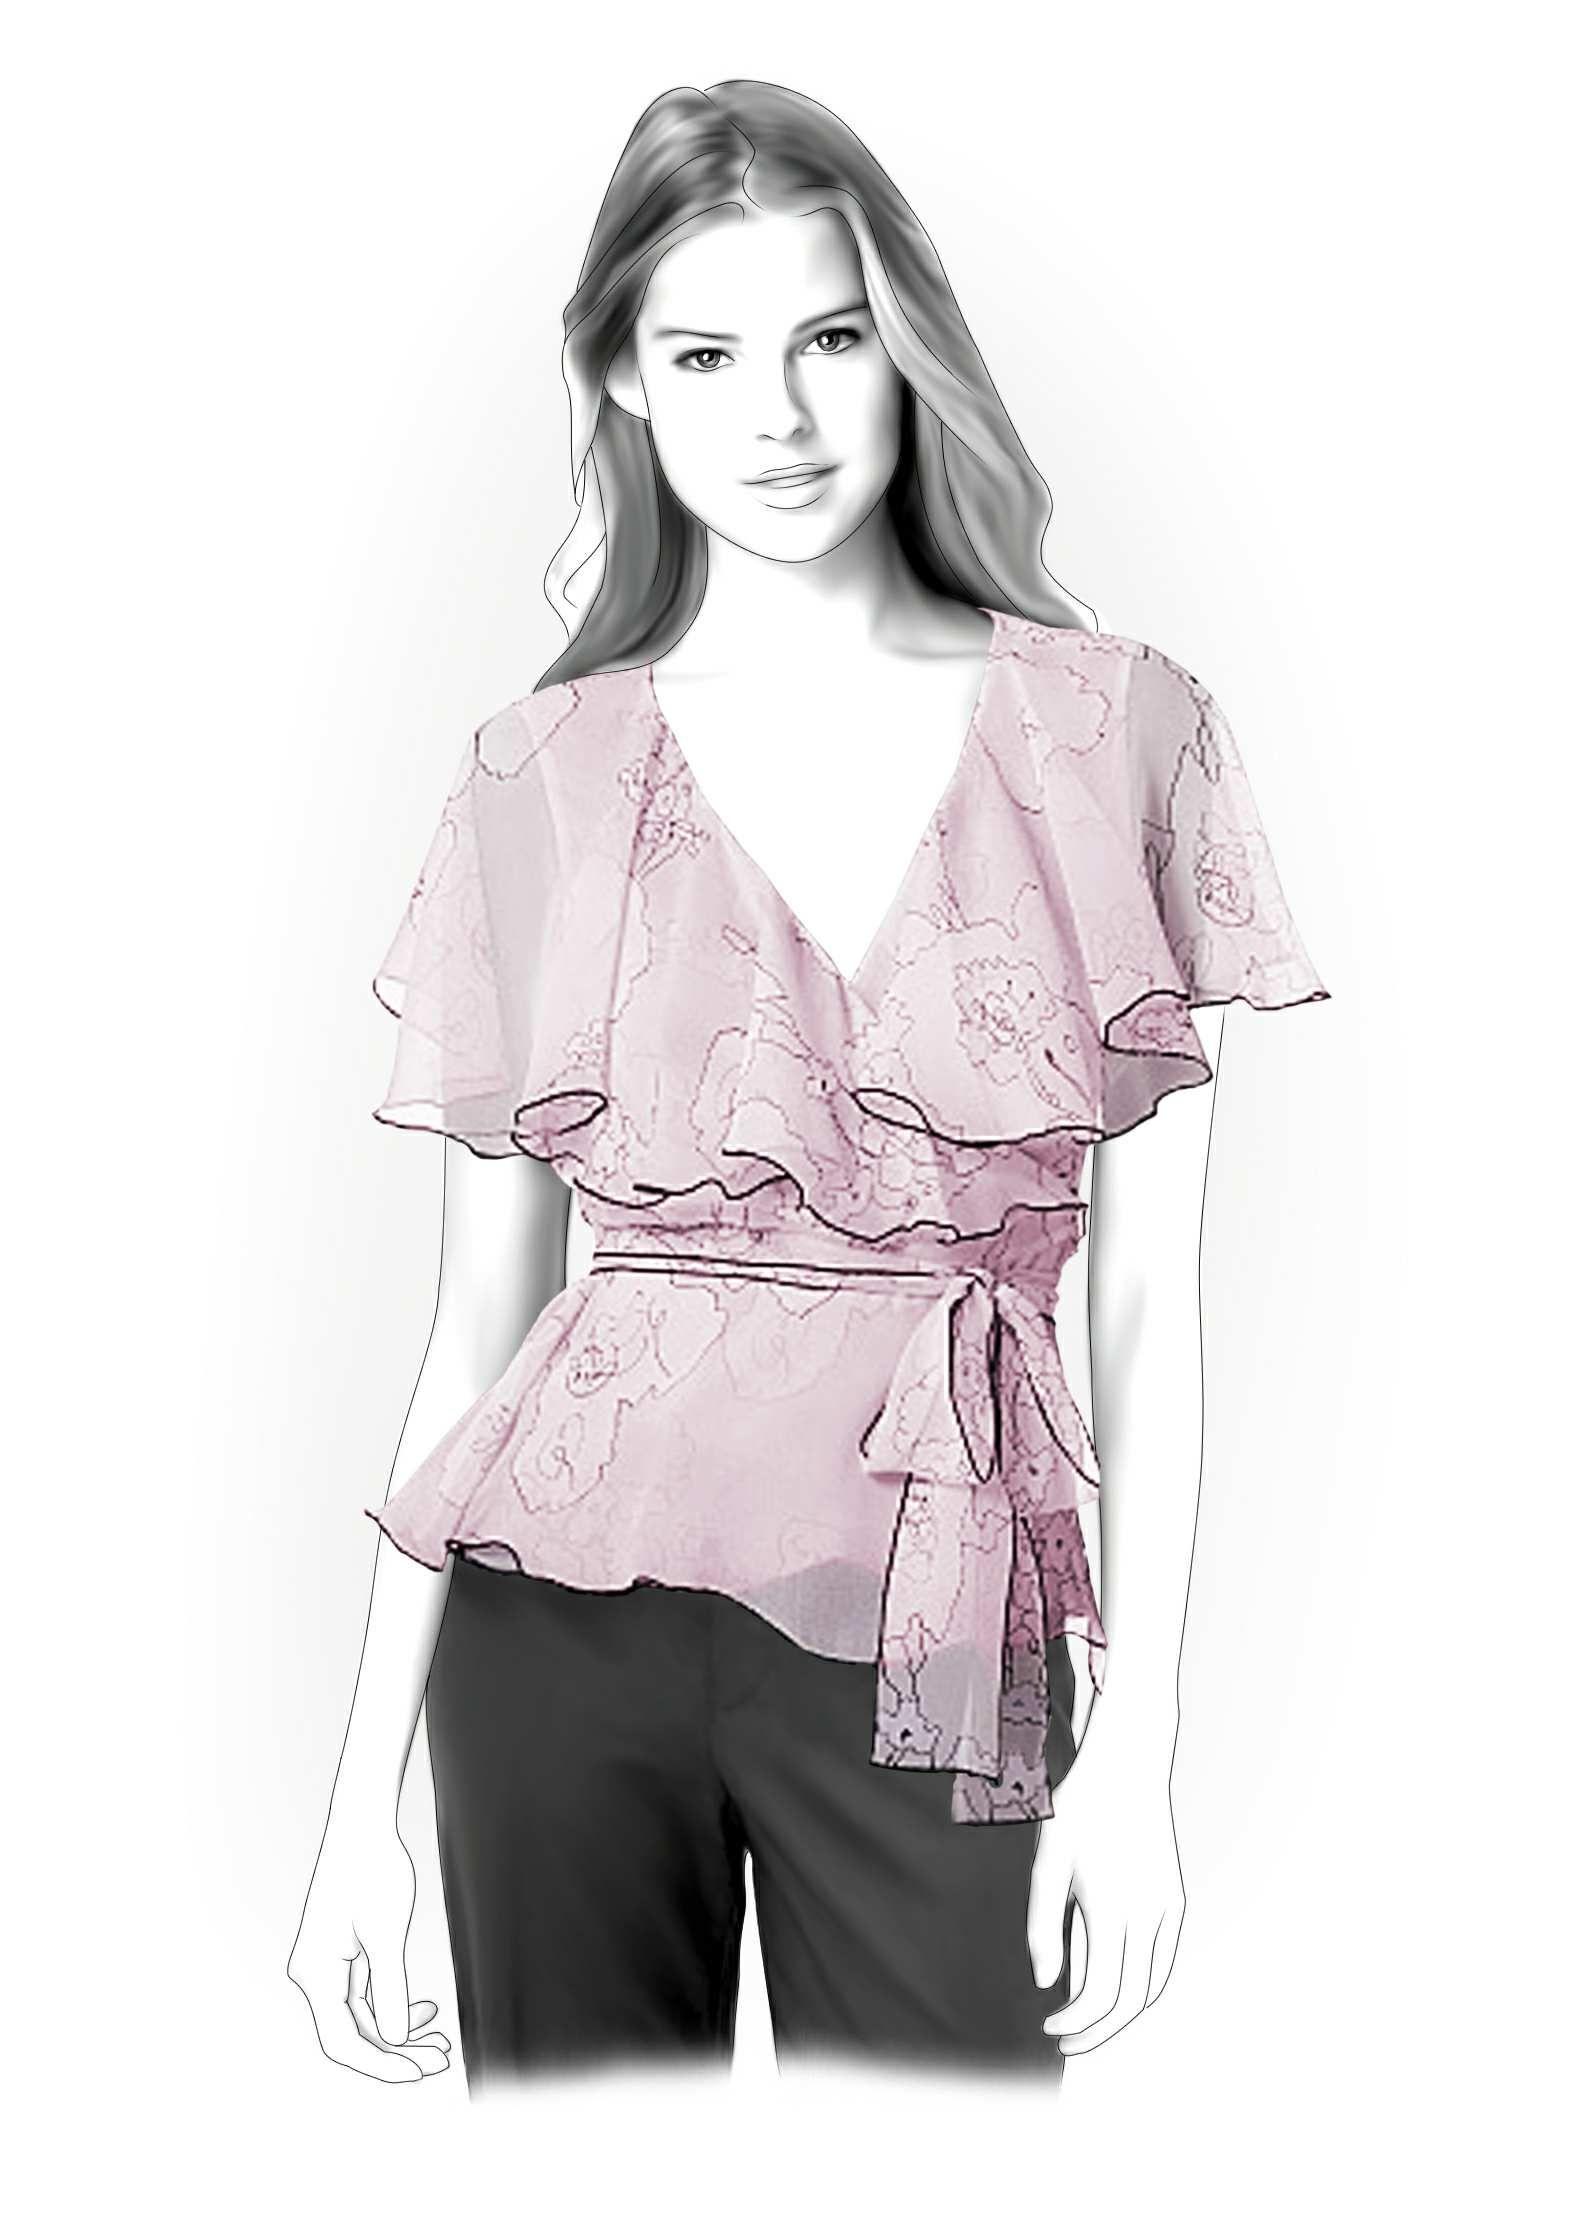 Chiffon Blouse - Sewing Pattern #4238. Made-to-measure sewing ...